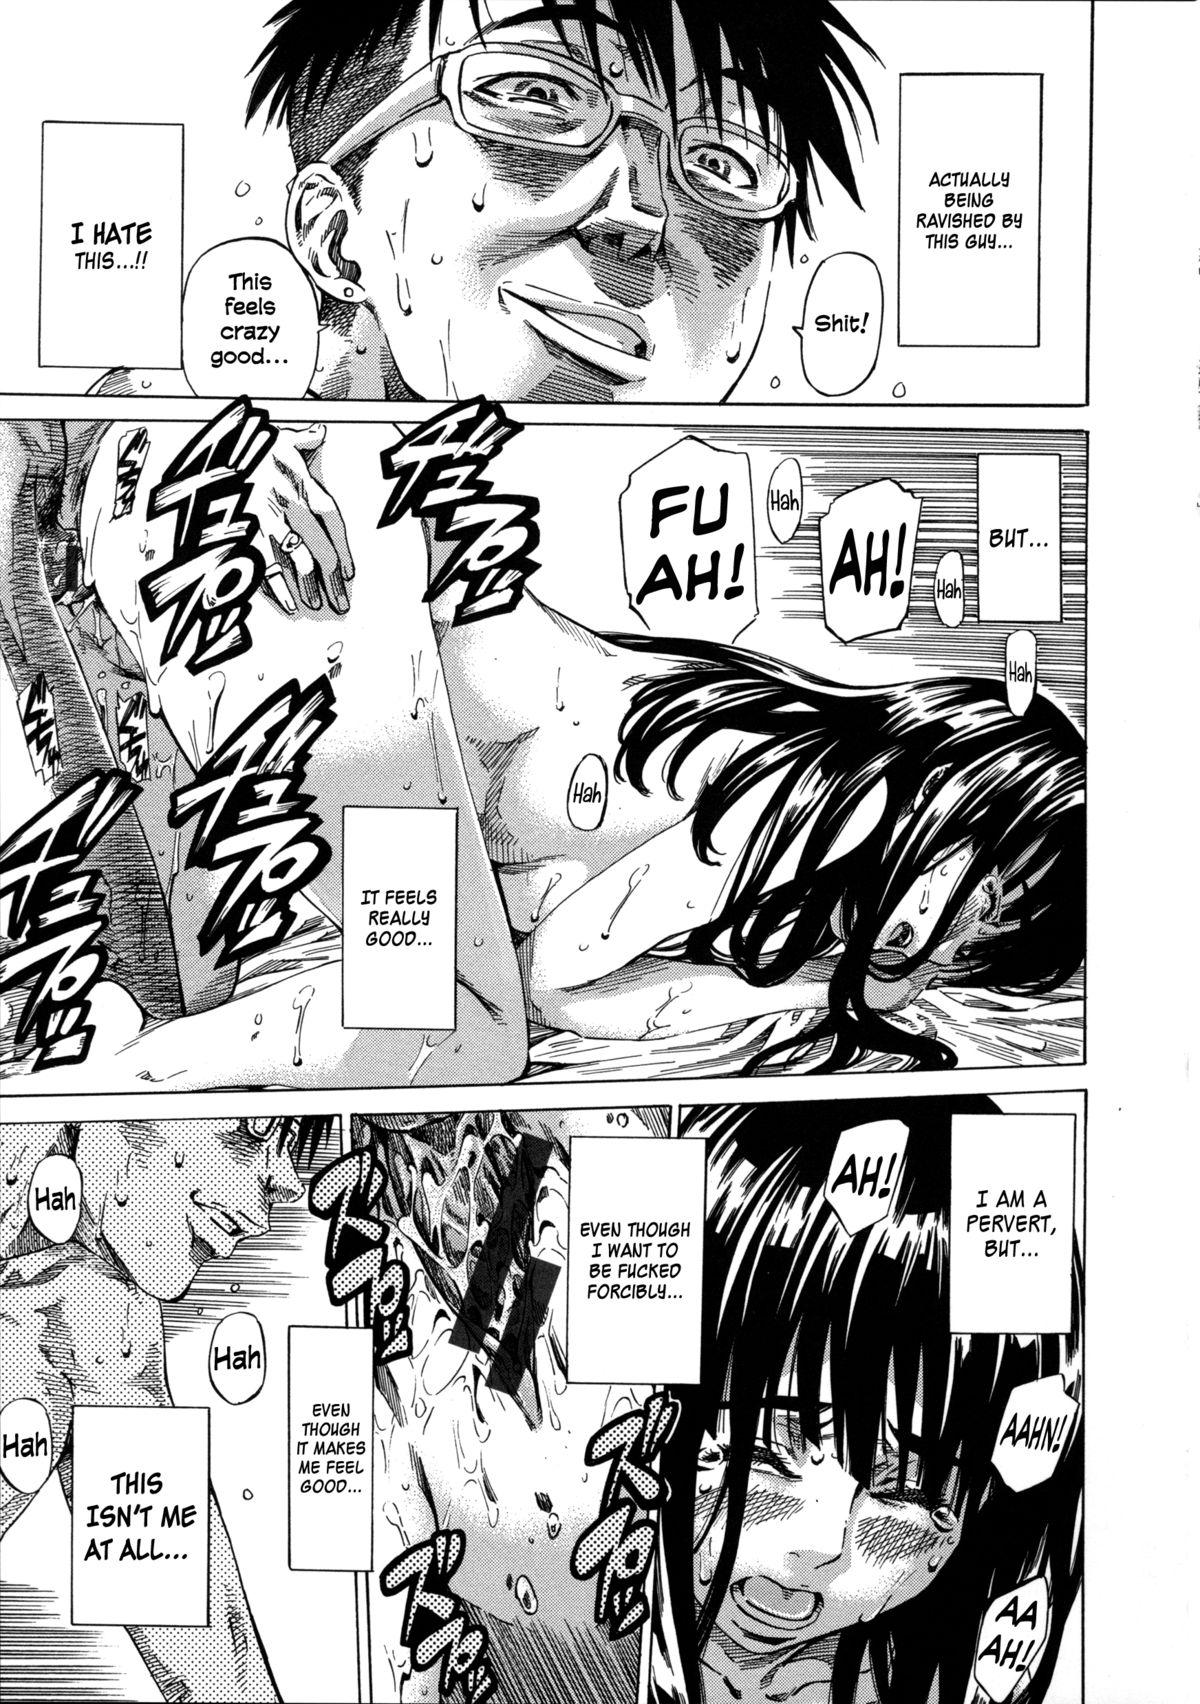 Kashiwazaki Miki wa Ironna Basho de Zenra Sanpo Shitemita   Miki Kashiwazaki Goes Naked in All Sorts of Places Ch. 1-4 85